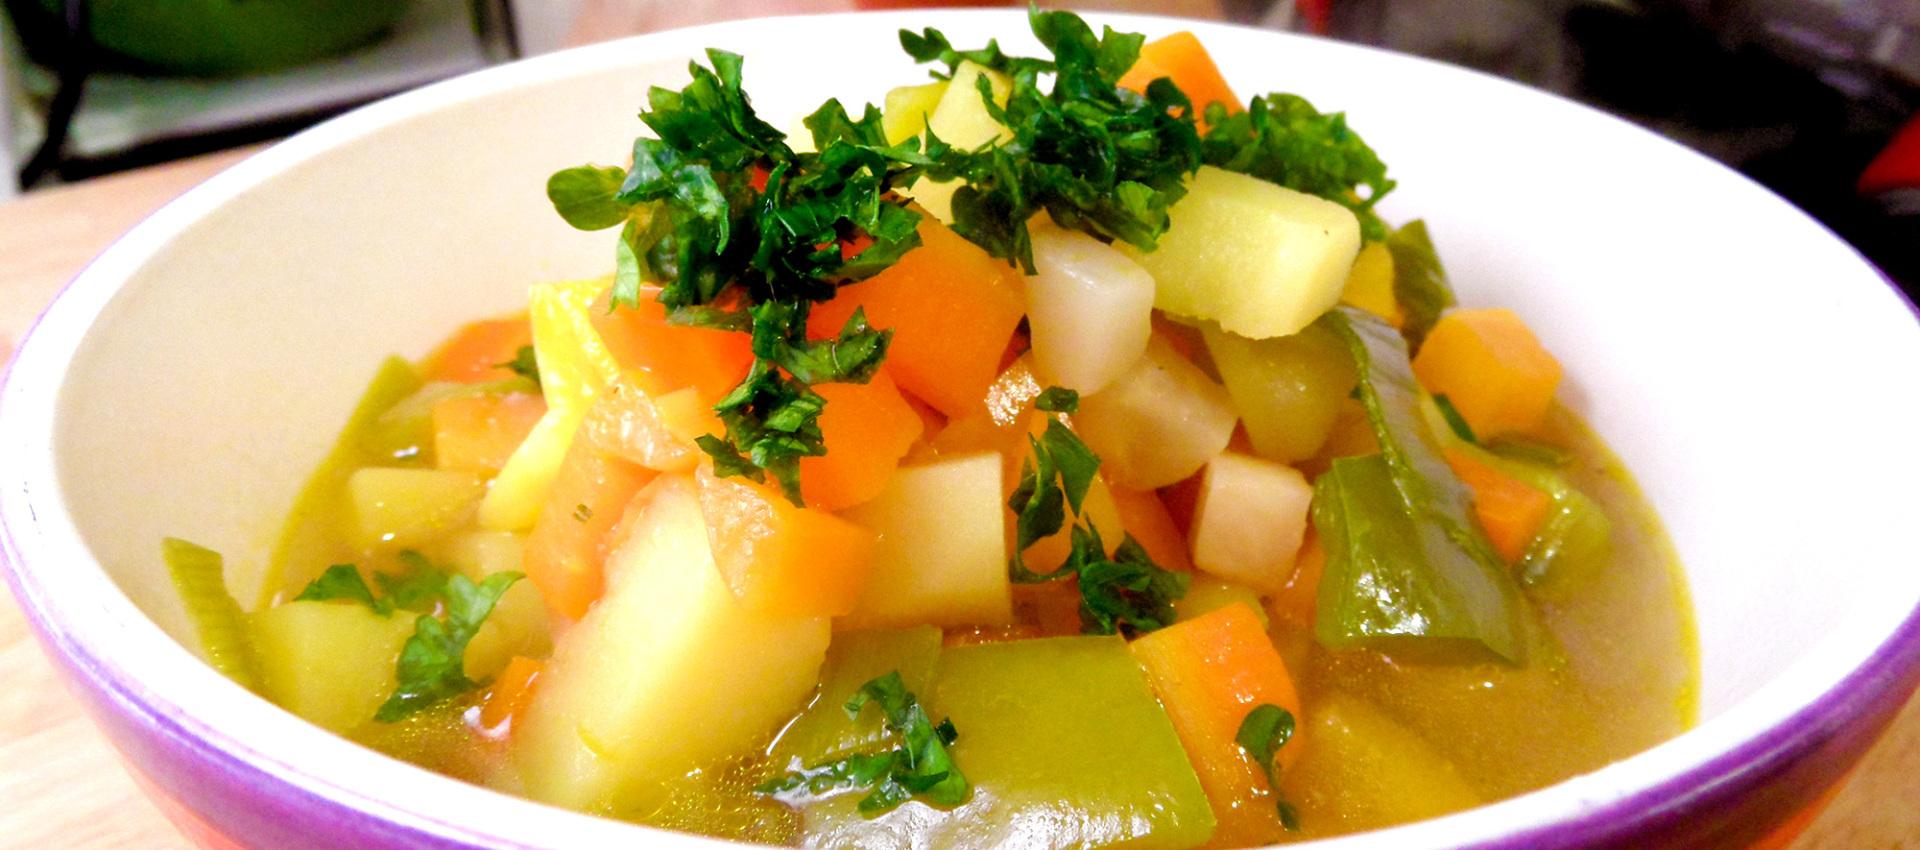 Rezept Gemüsesuppe mit Paprika & Sellerie - kochbock.de